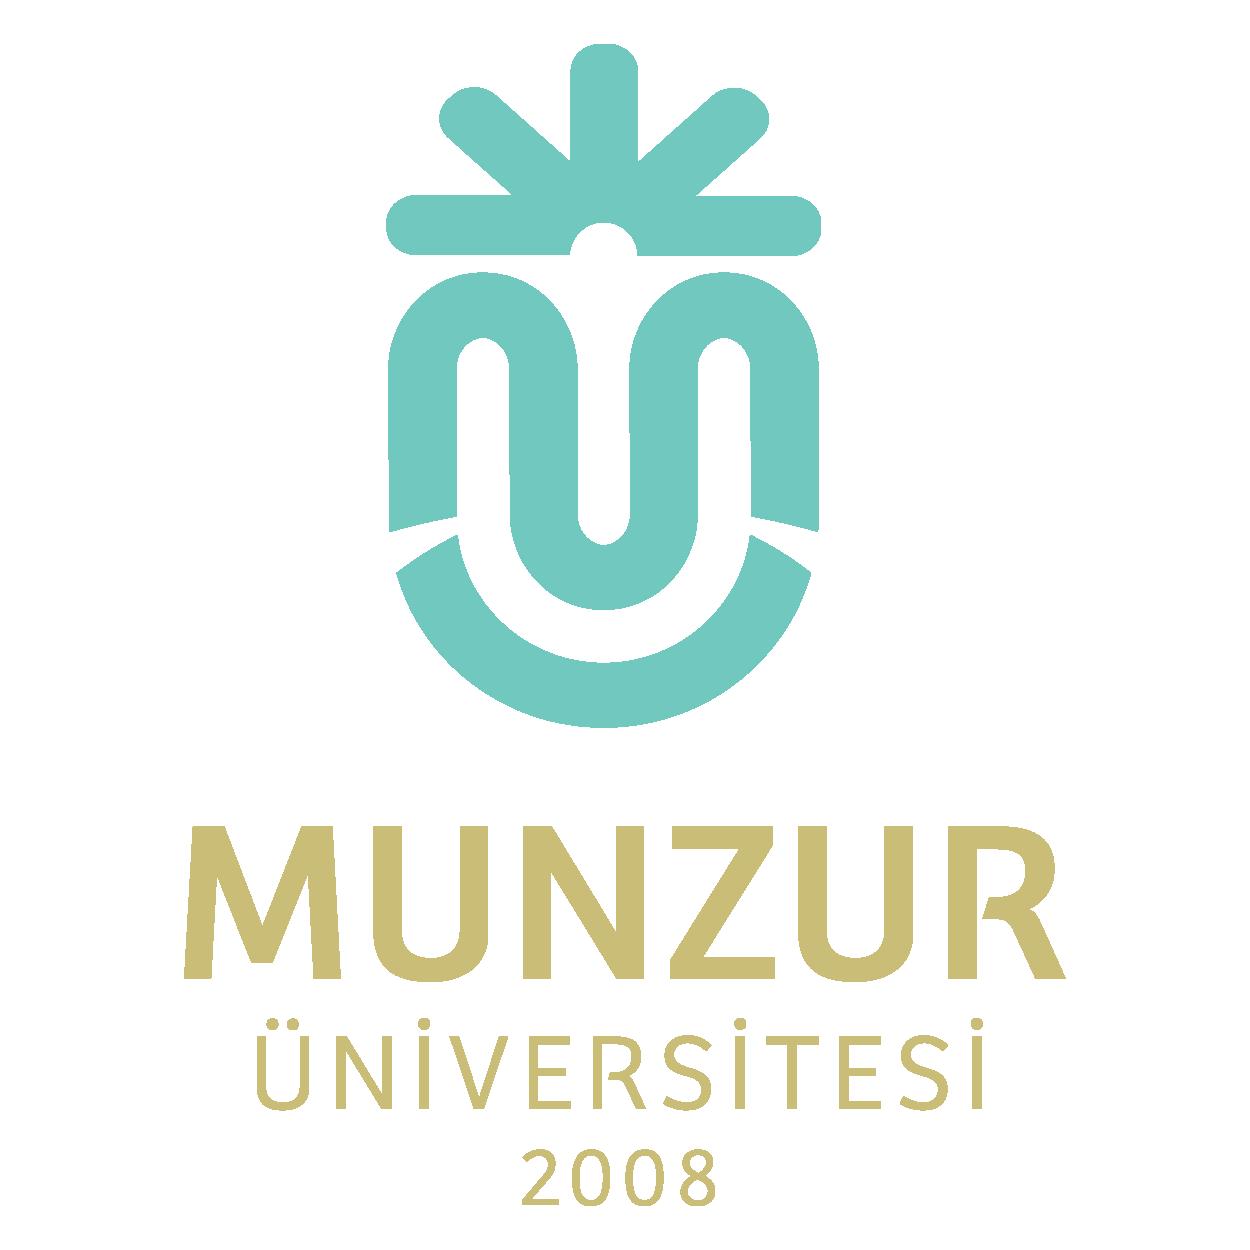 Munzur Üniversitesi Logo (Tunceli) png